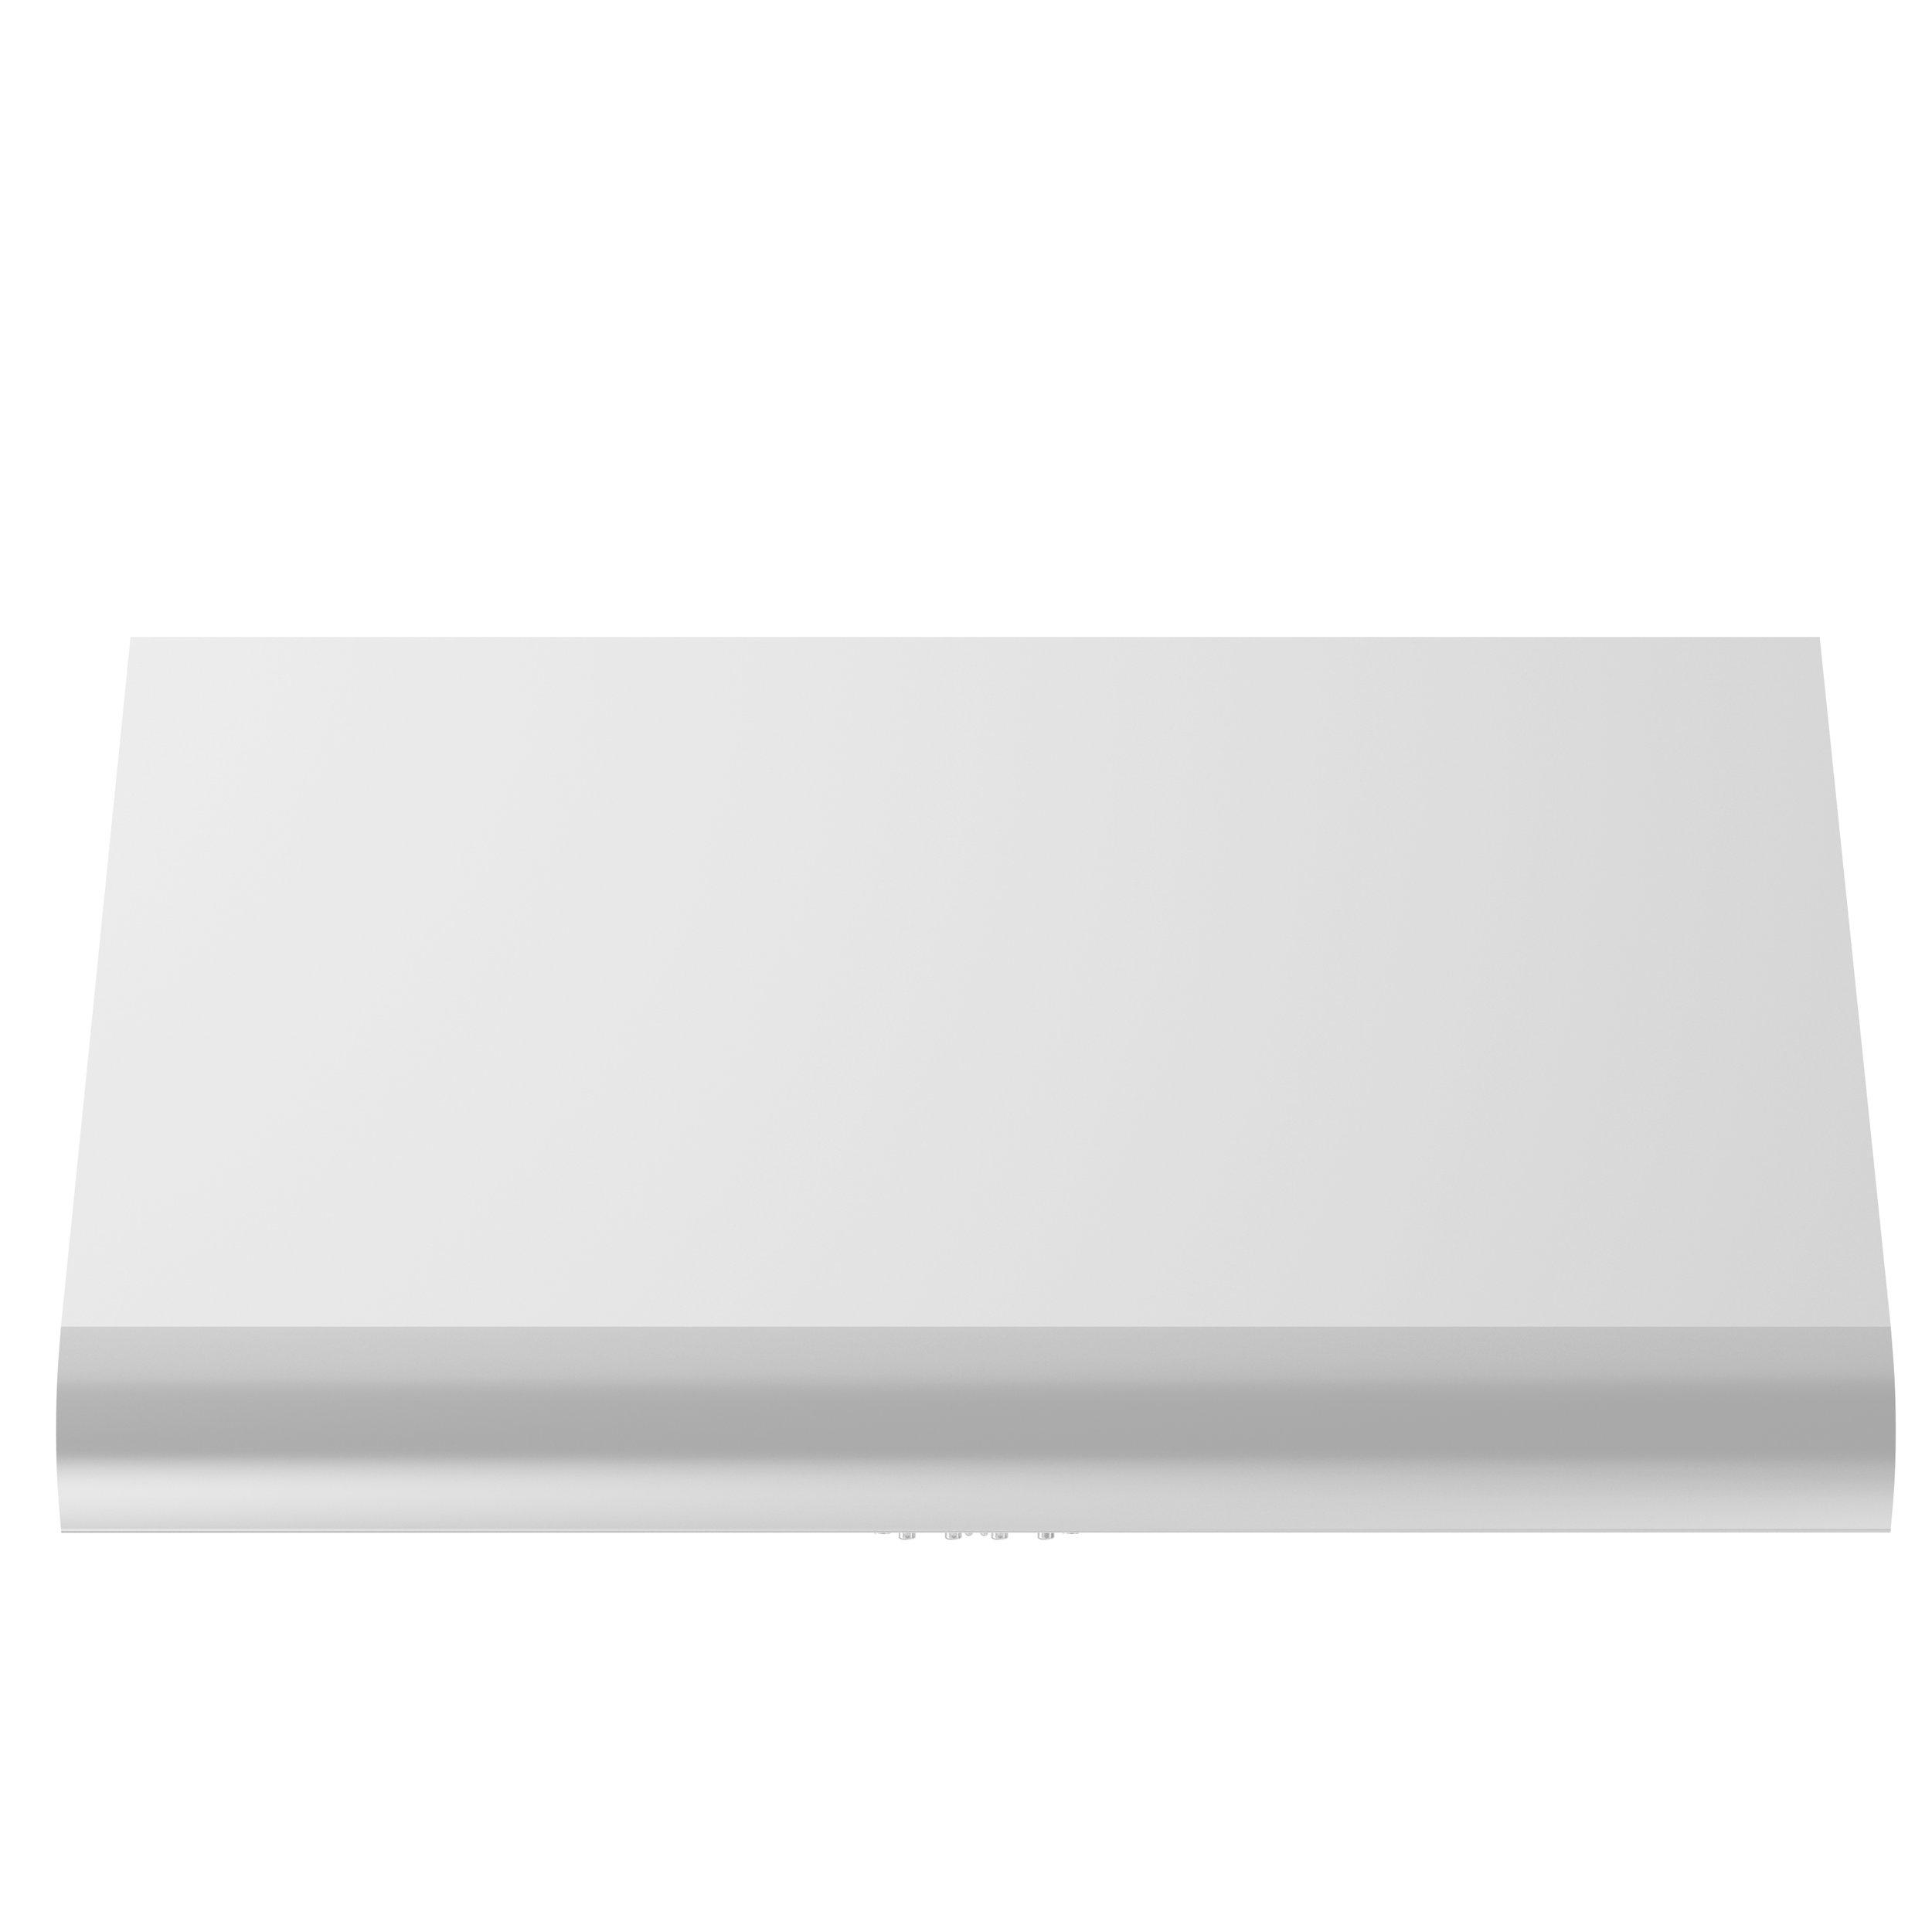 zline-stainless-steel-under-cabinet-range-hood-527-front.jpeg